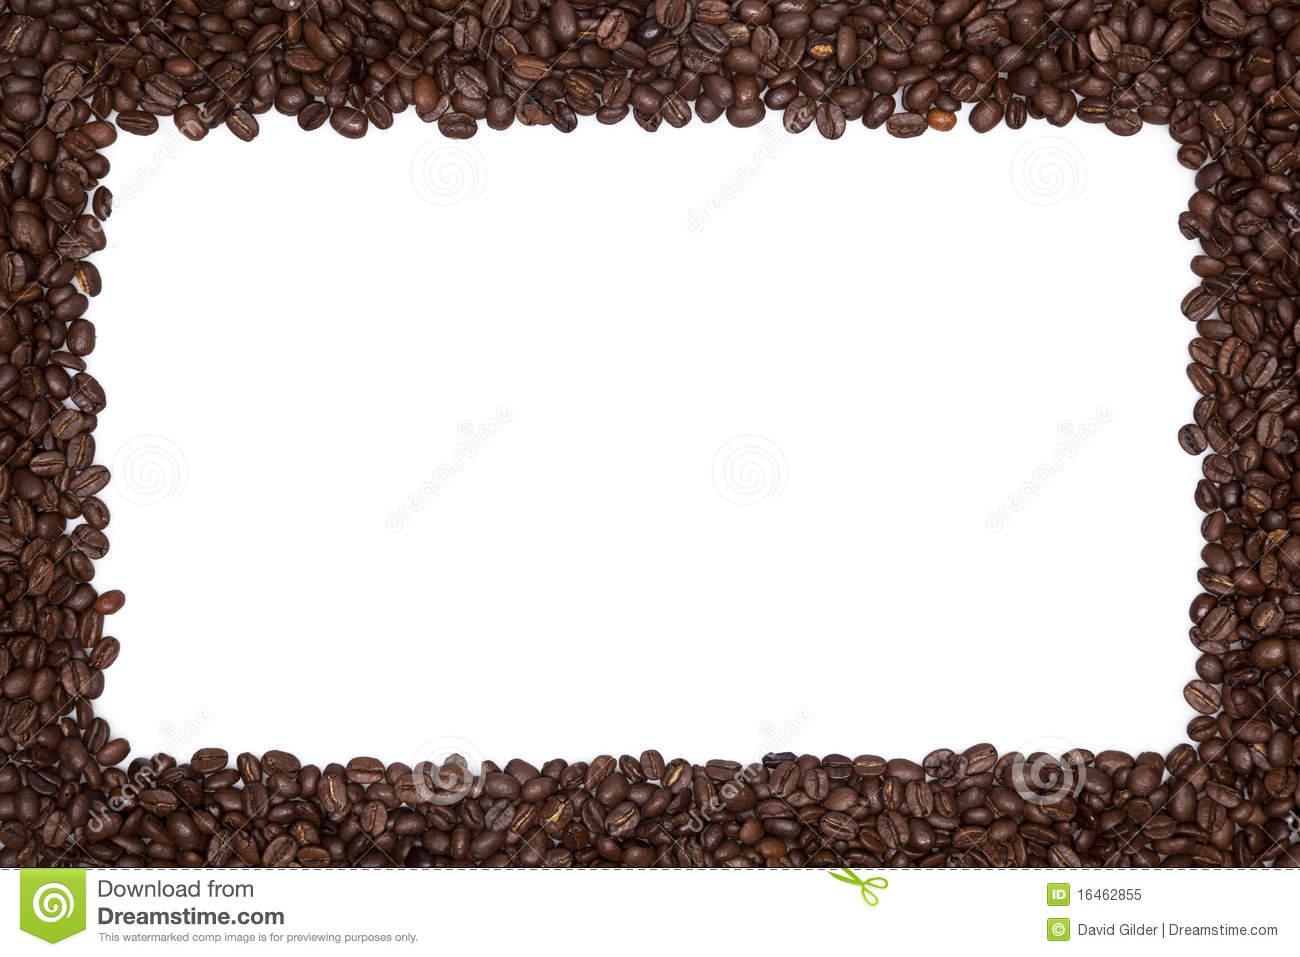 Coffee Bean Border ~ Coffee border clipart suggest